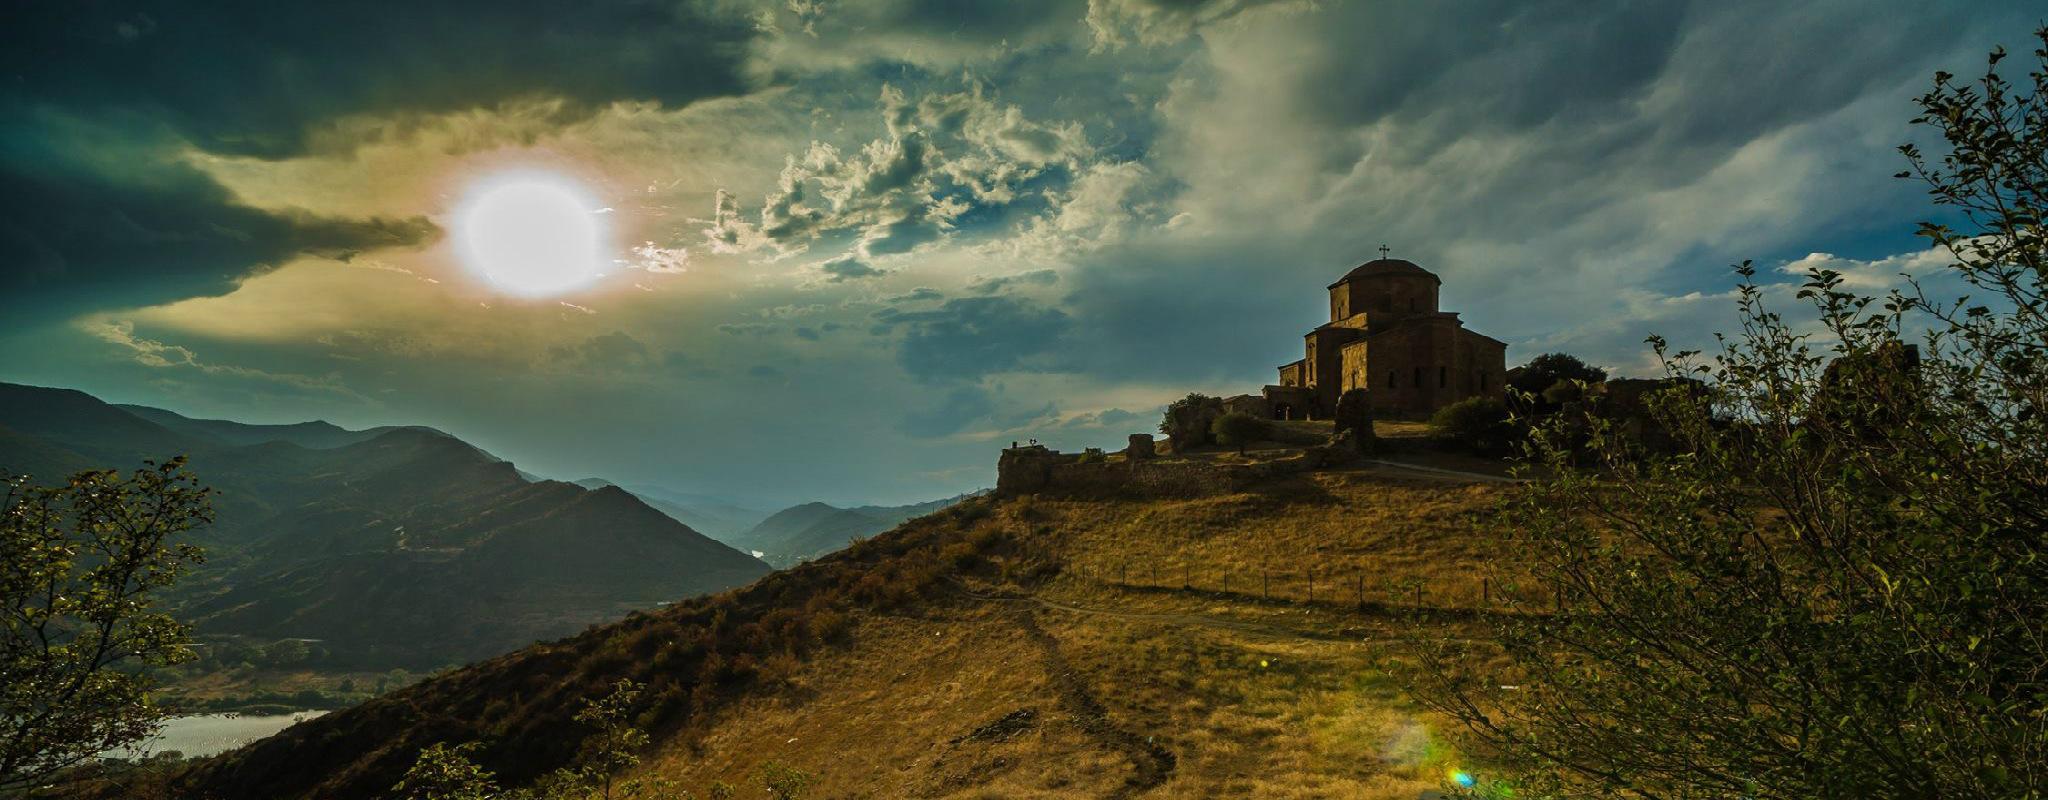 Mtskheta-Shiomghvime